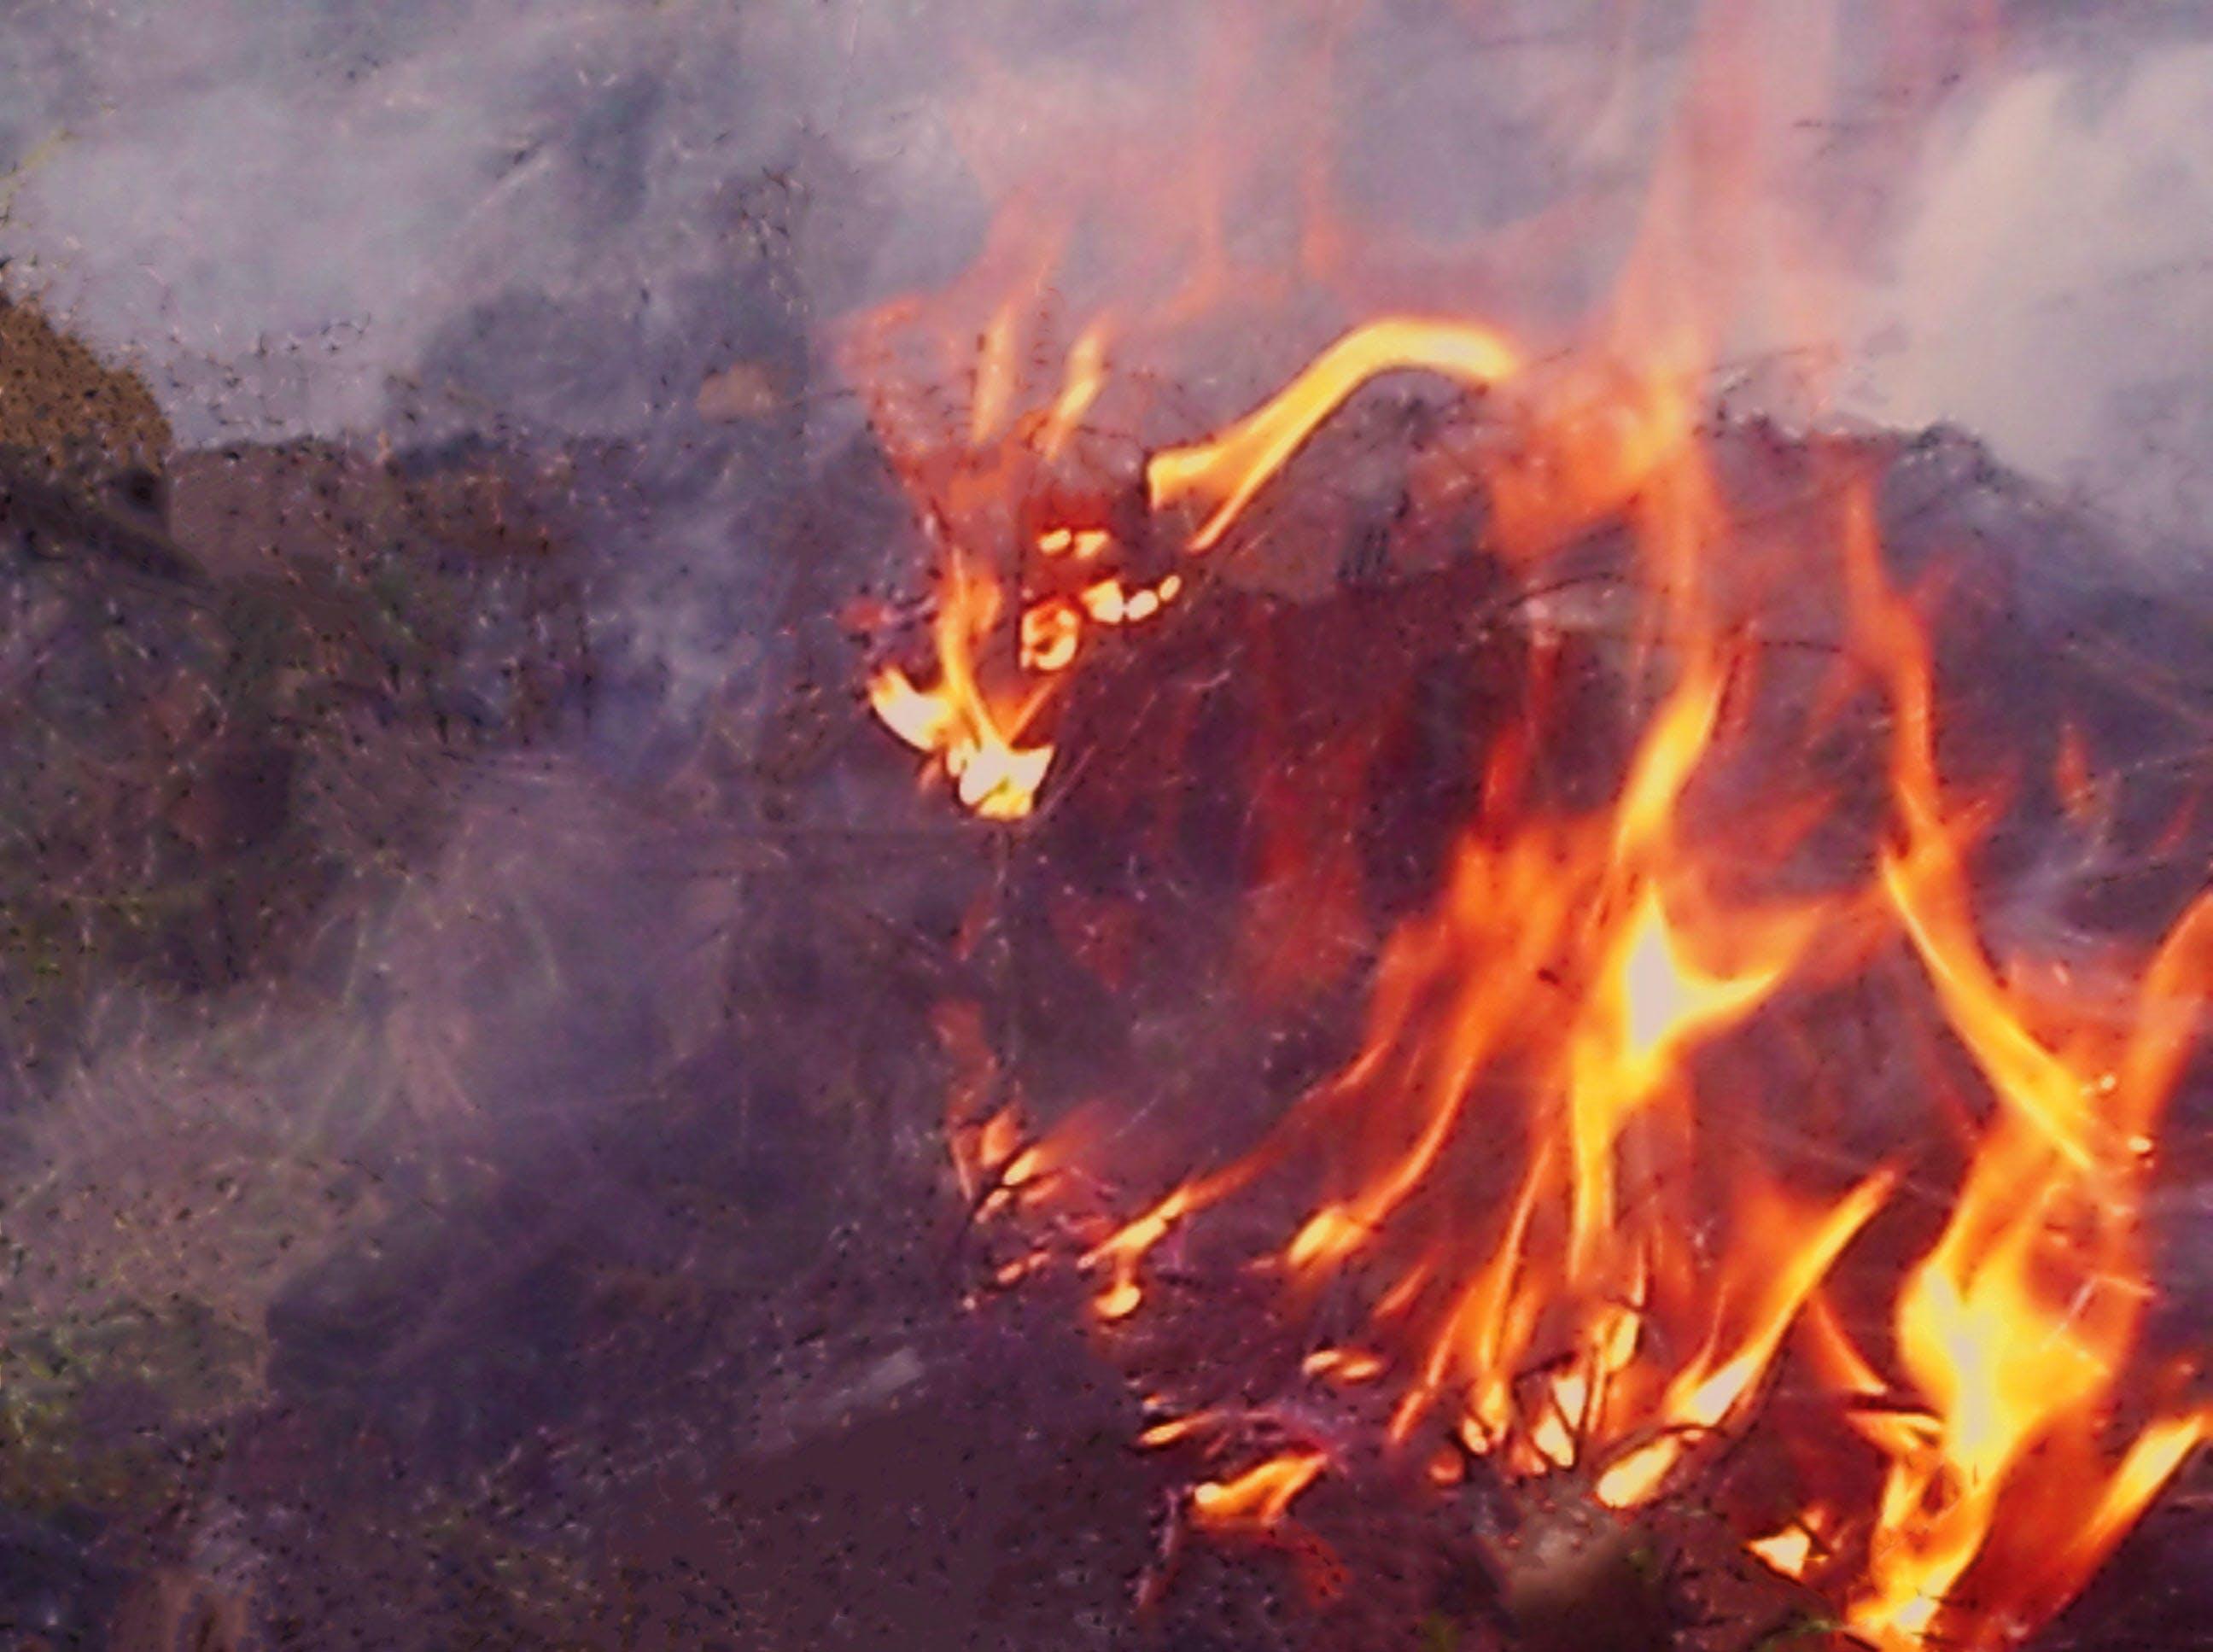 Free stock photo of fire, firearm, fireplace, forest fire